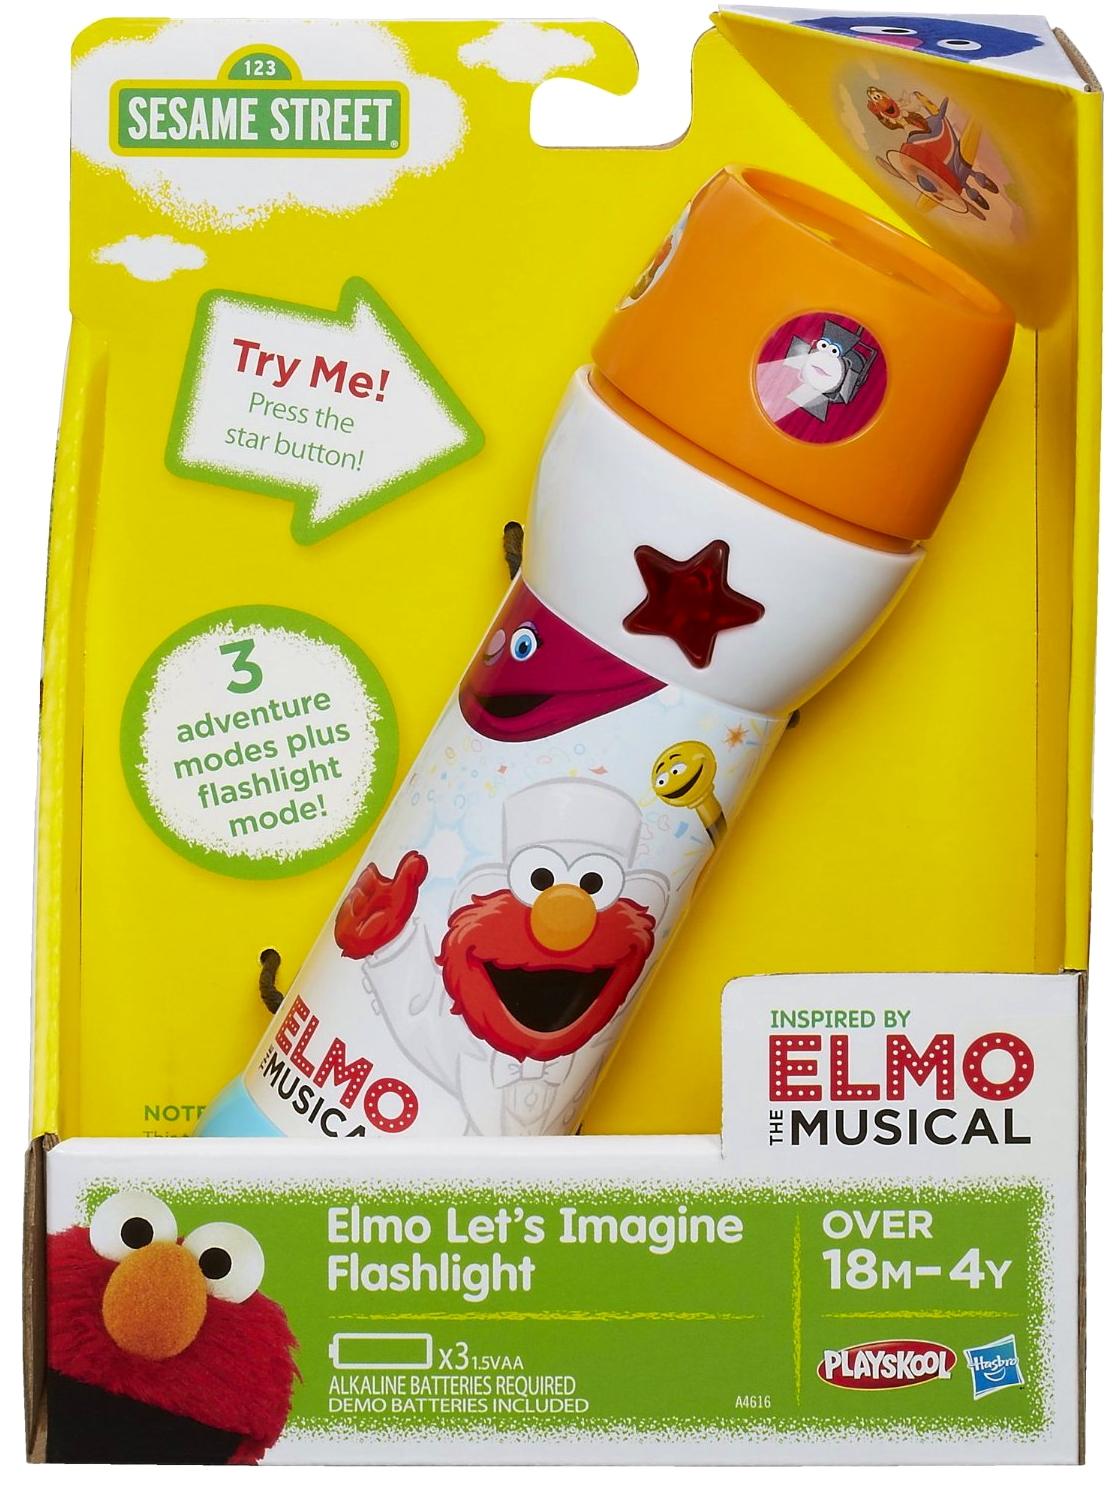 Elmo Let's Imagine Flashlight